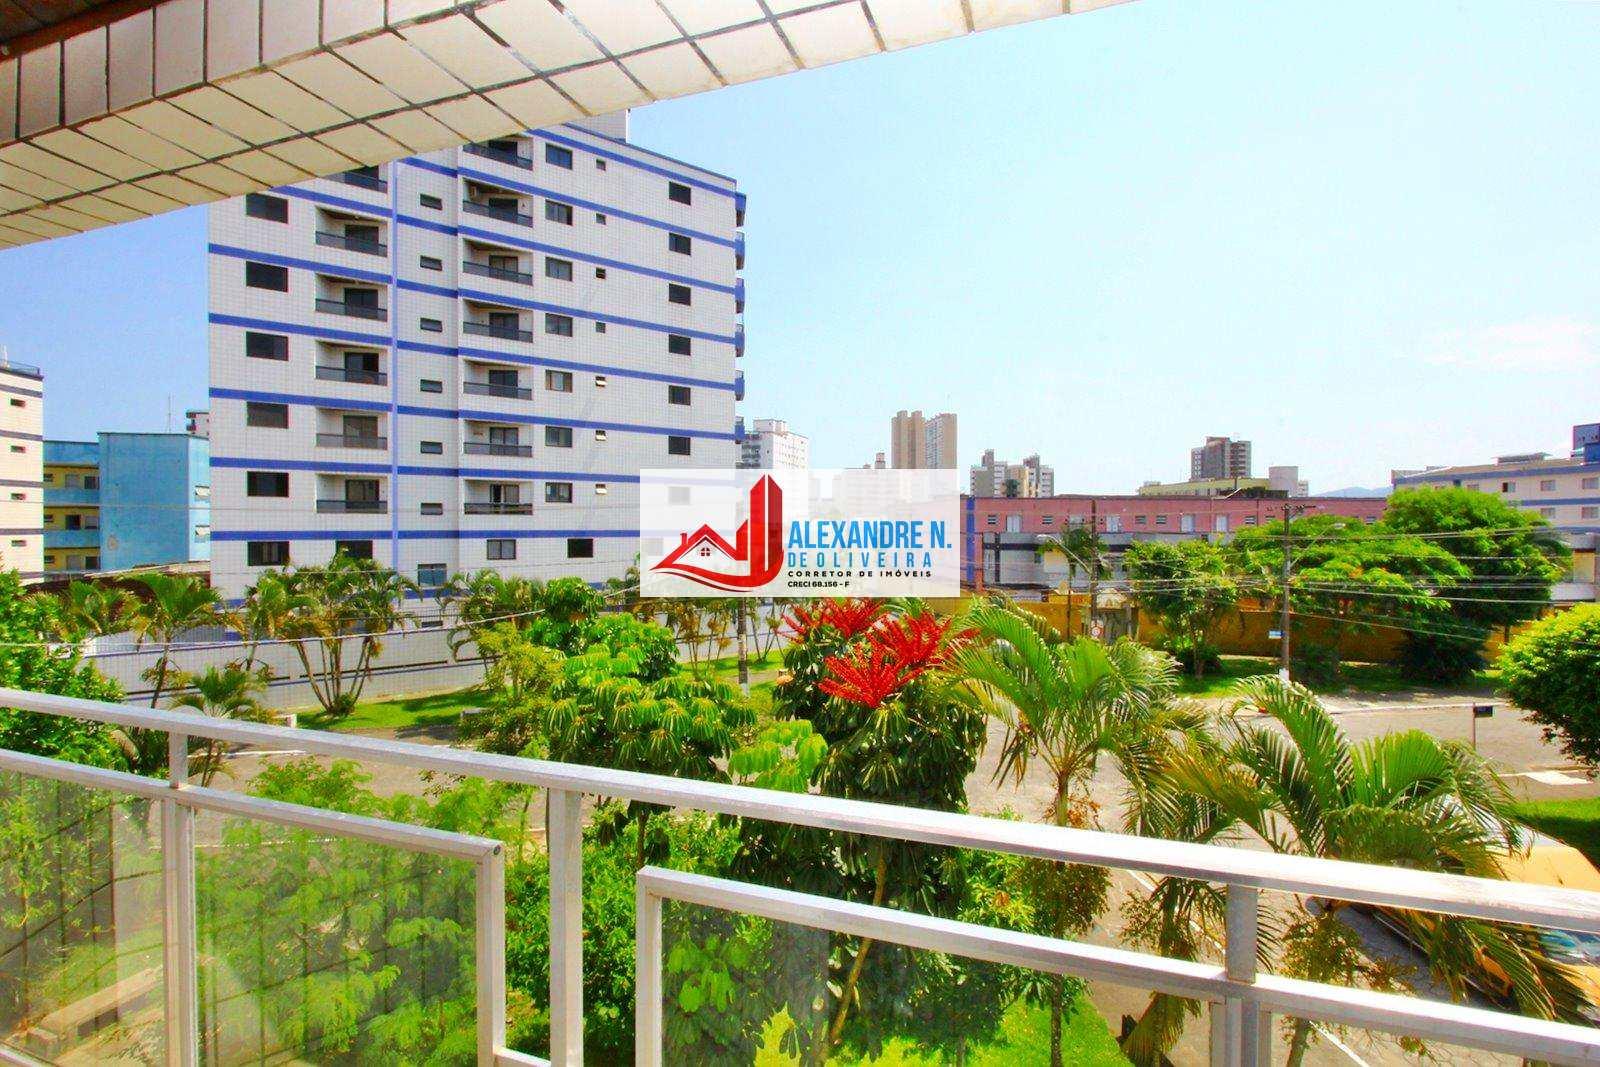 Apartamento 1 dorm, Mirim, Praia Grande, R$ 120 mil, AP00625